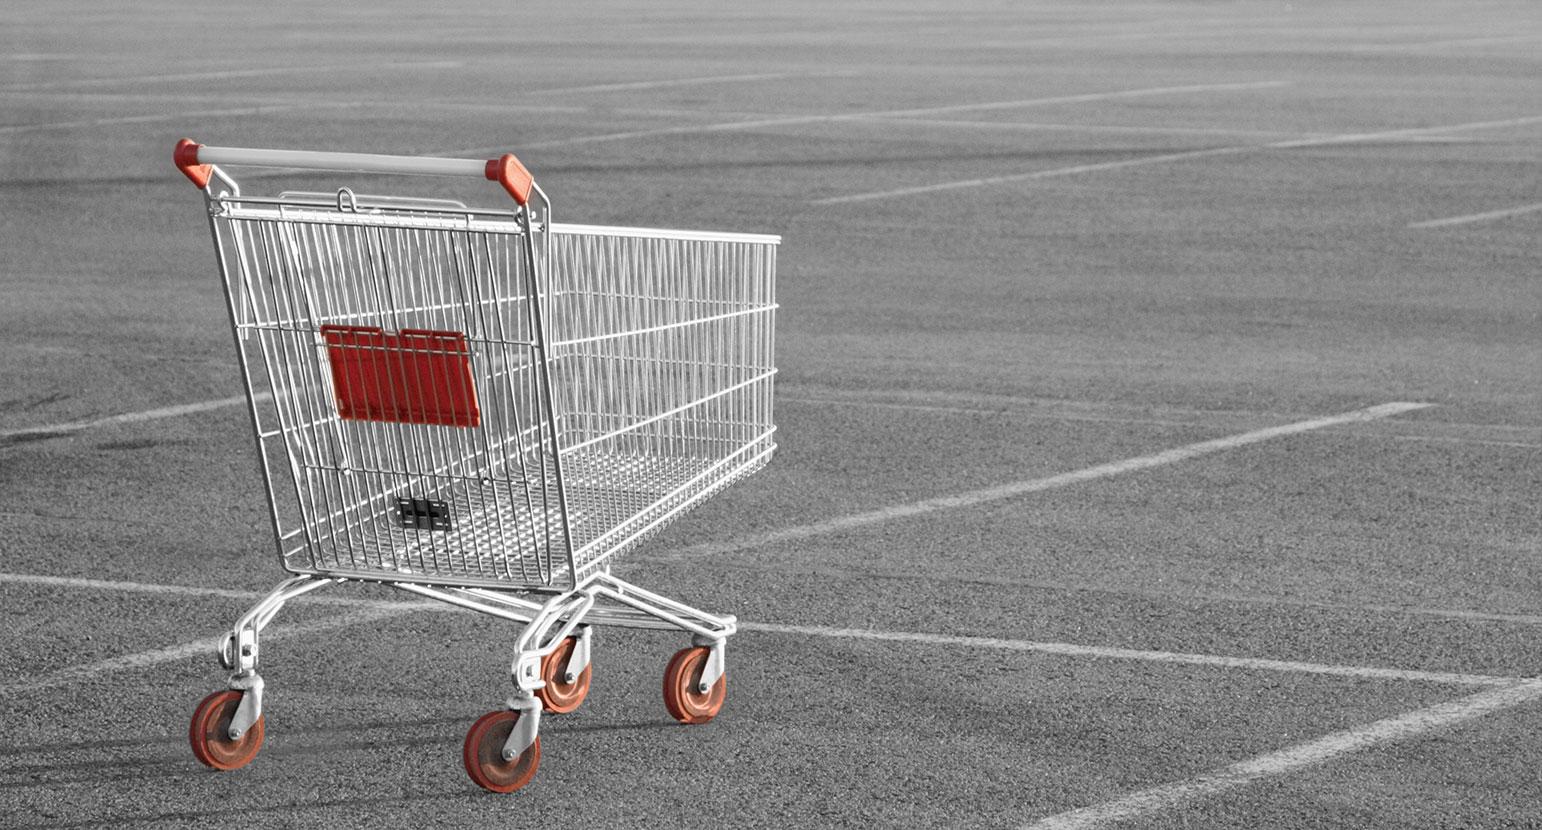 Aussie Retailers empty trolley in empty carpark